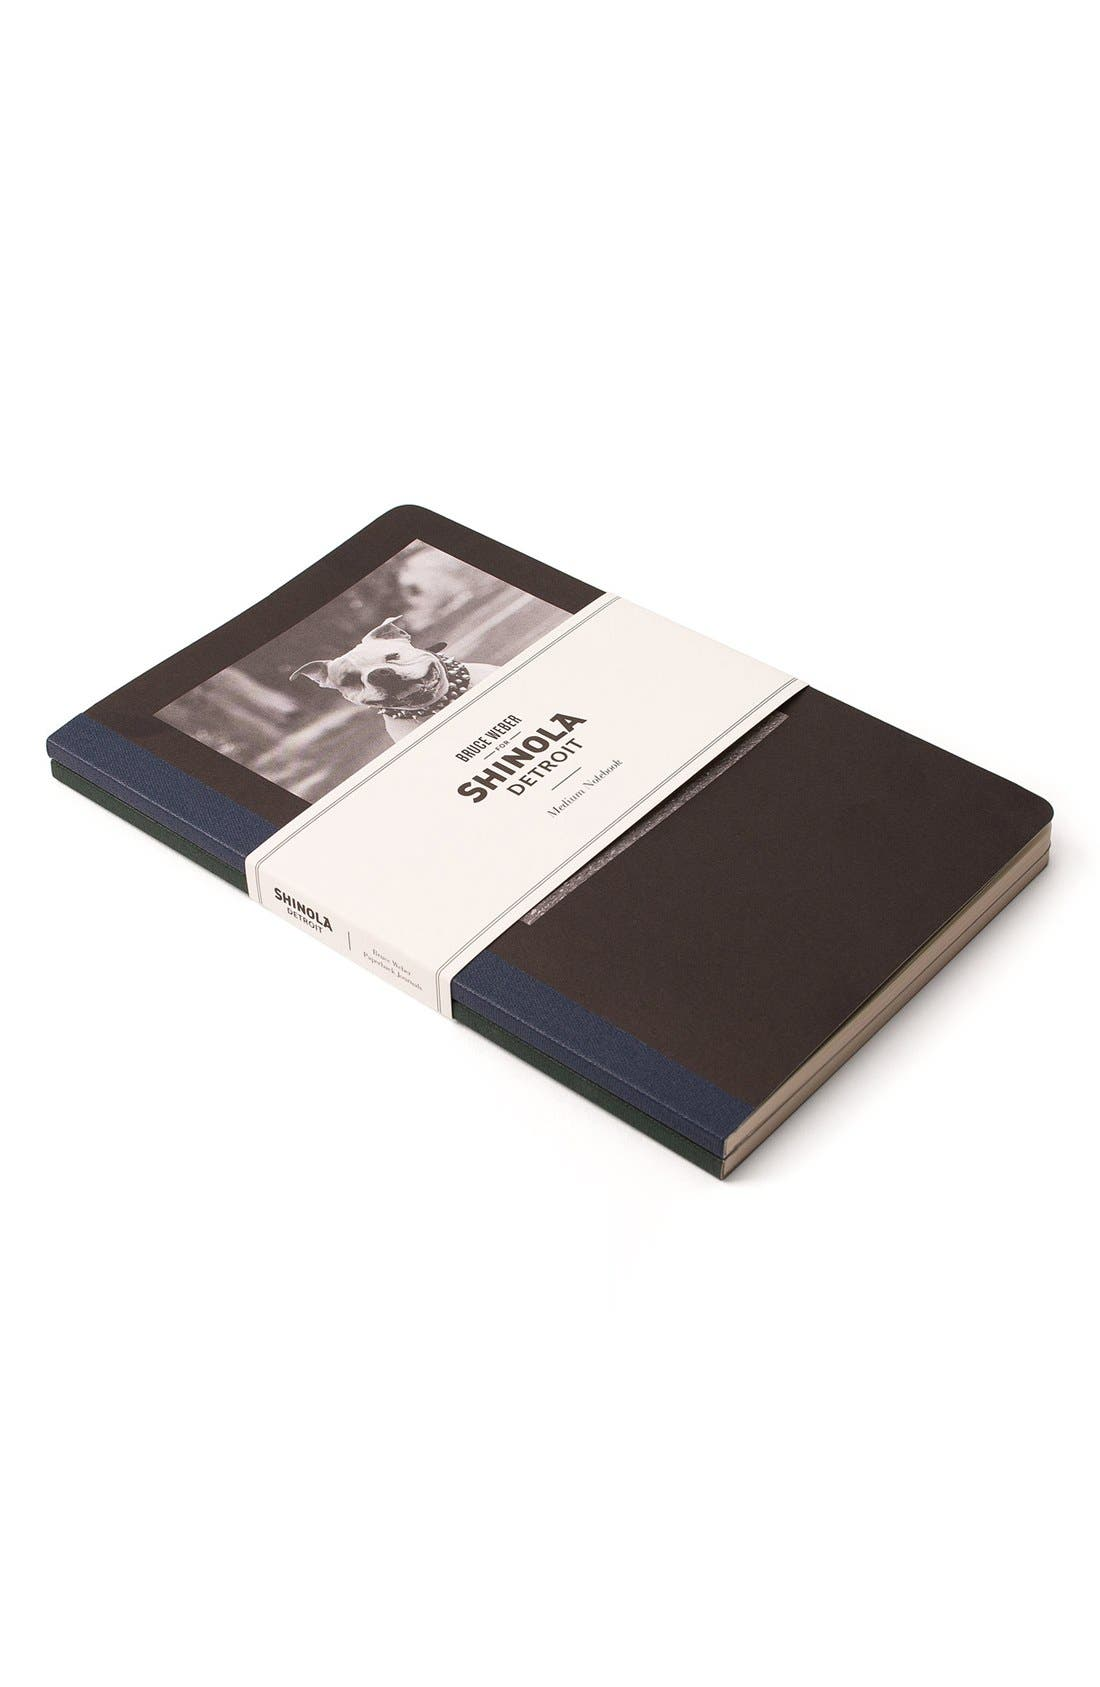 Main Image - Shinola 'All American' Journal (2-Pack)